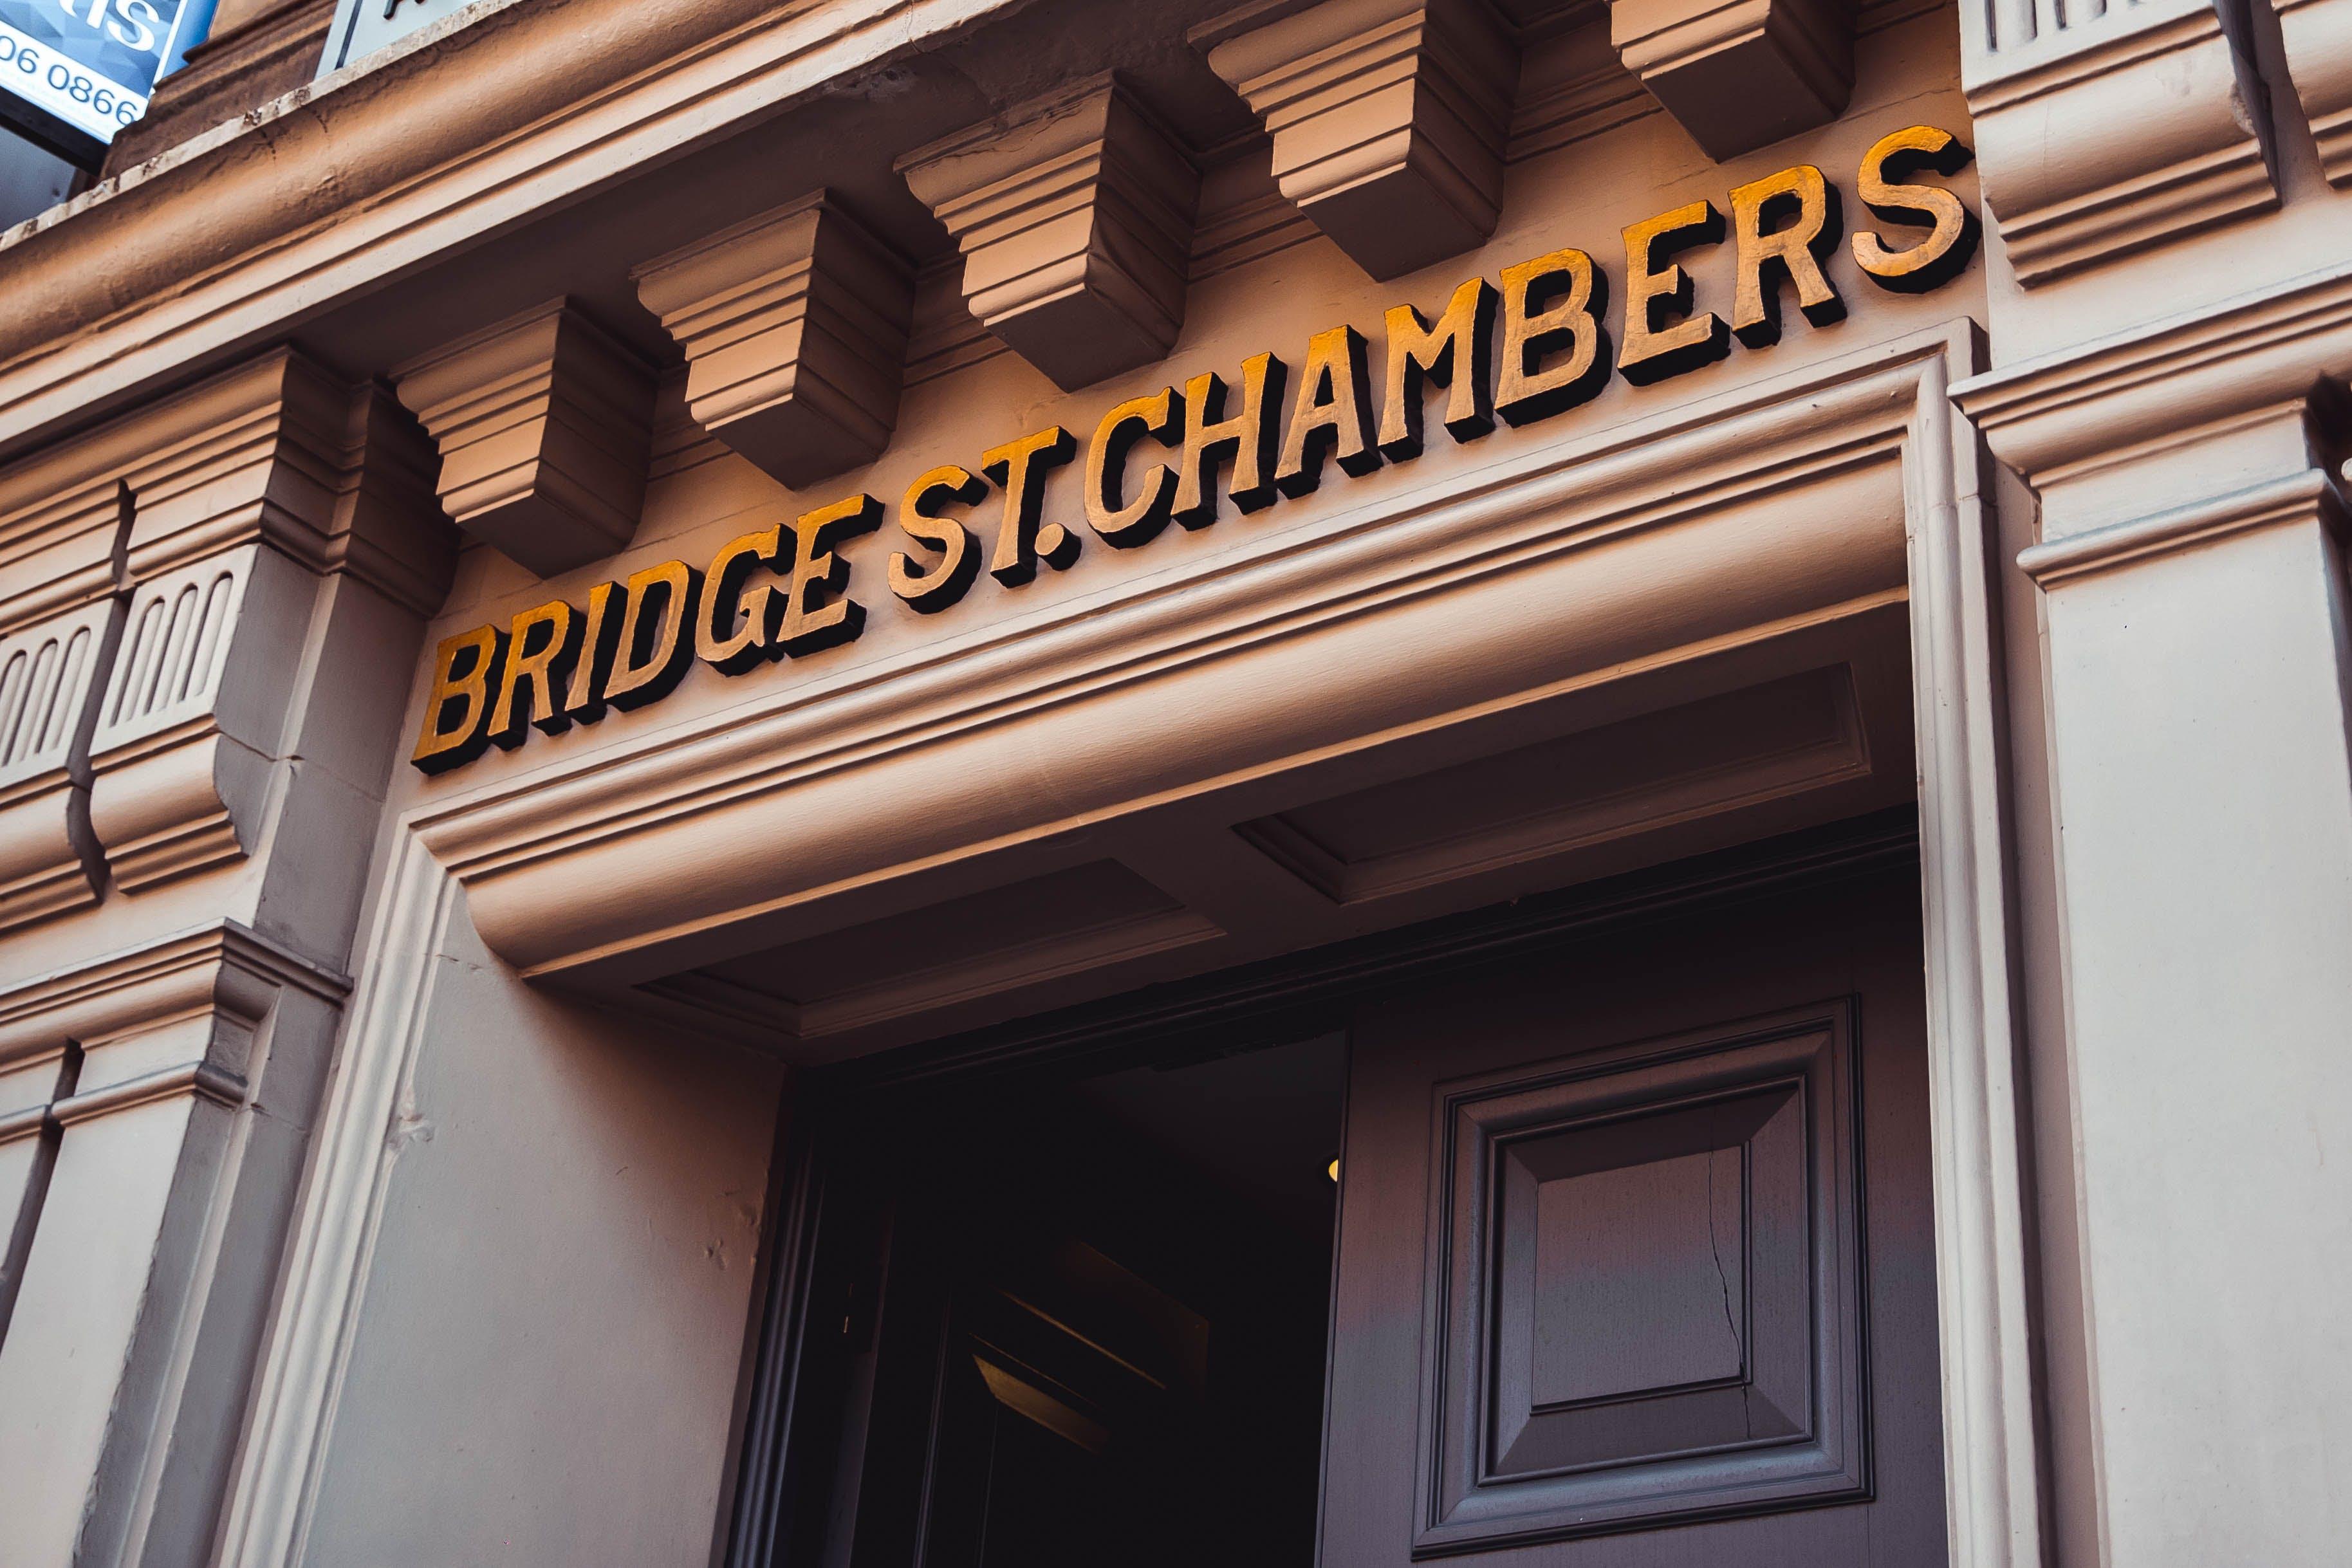 72 Bridge Street, Manchester, Office To Let - A06I7223.jpg